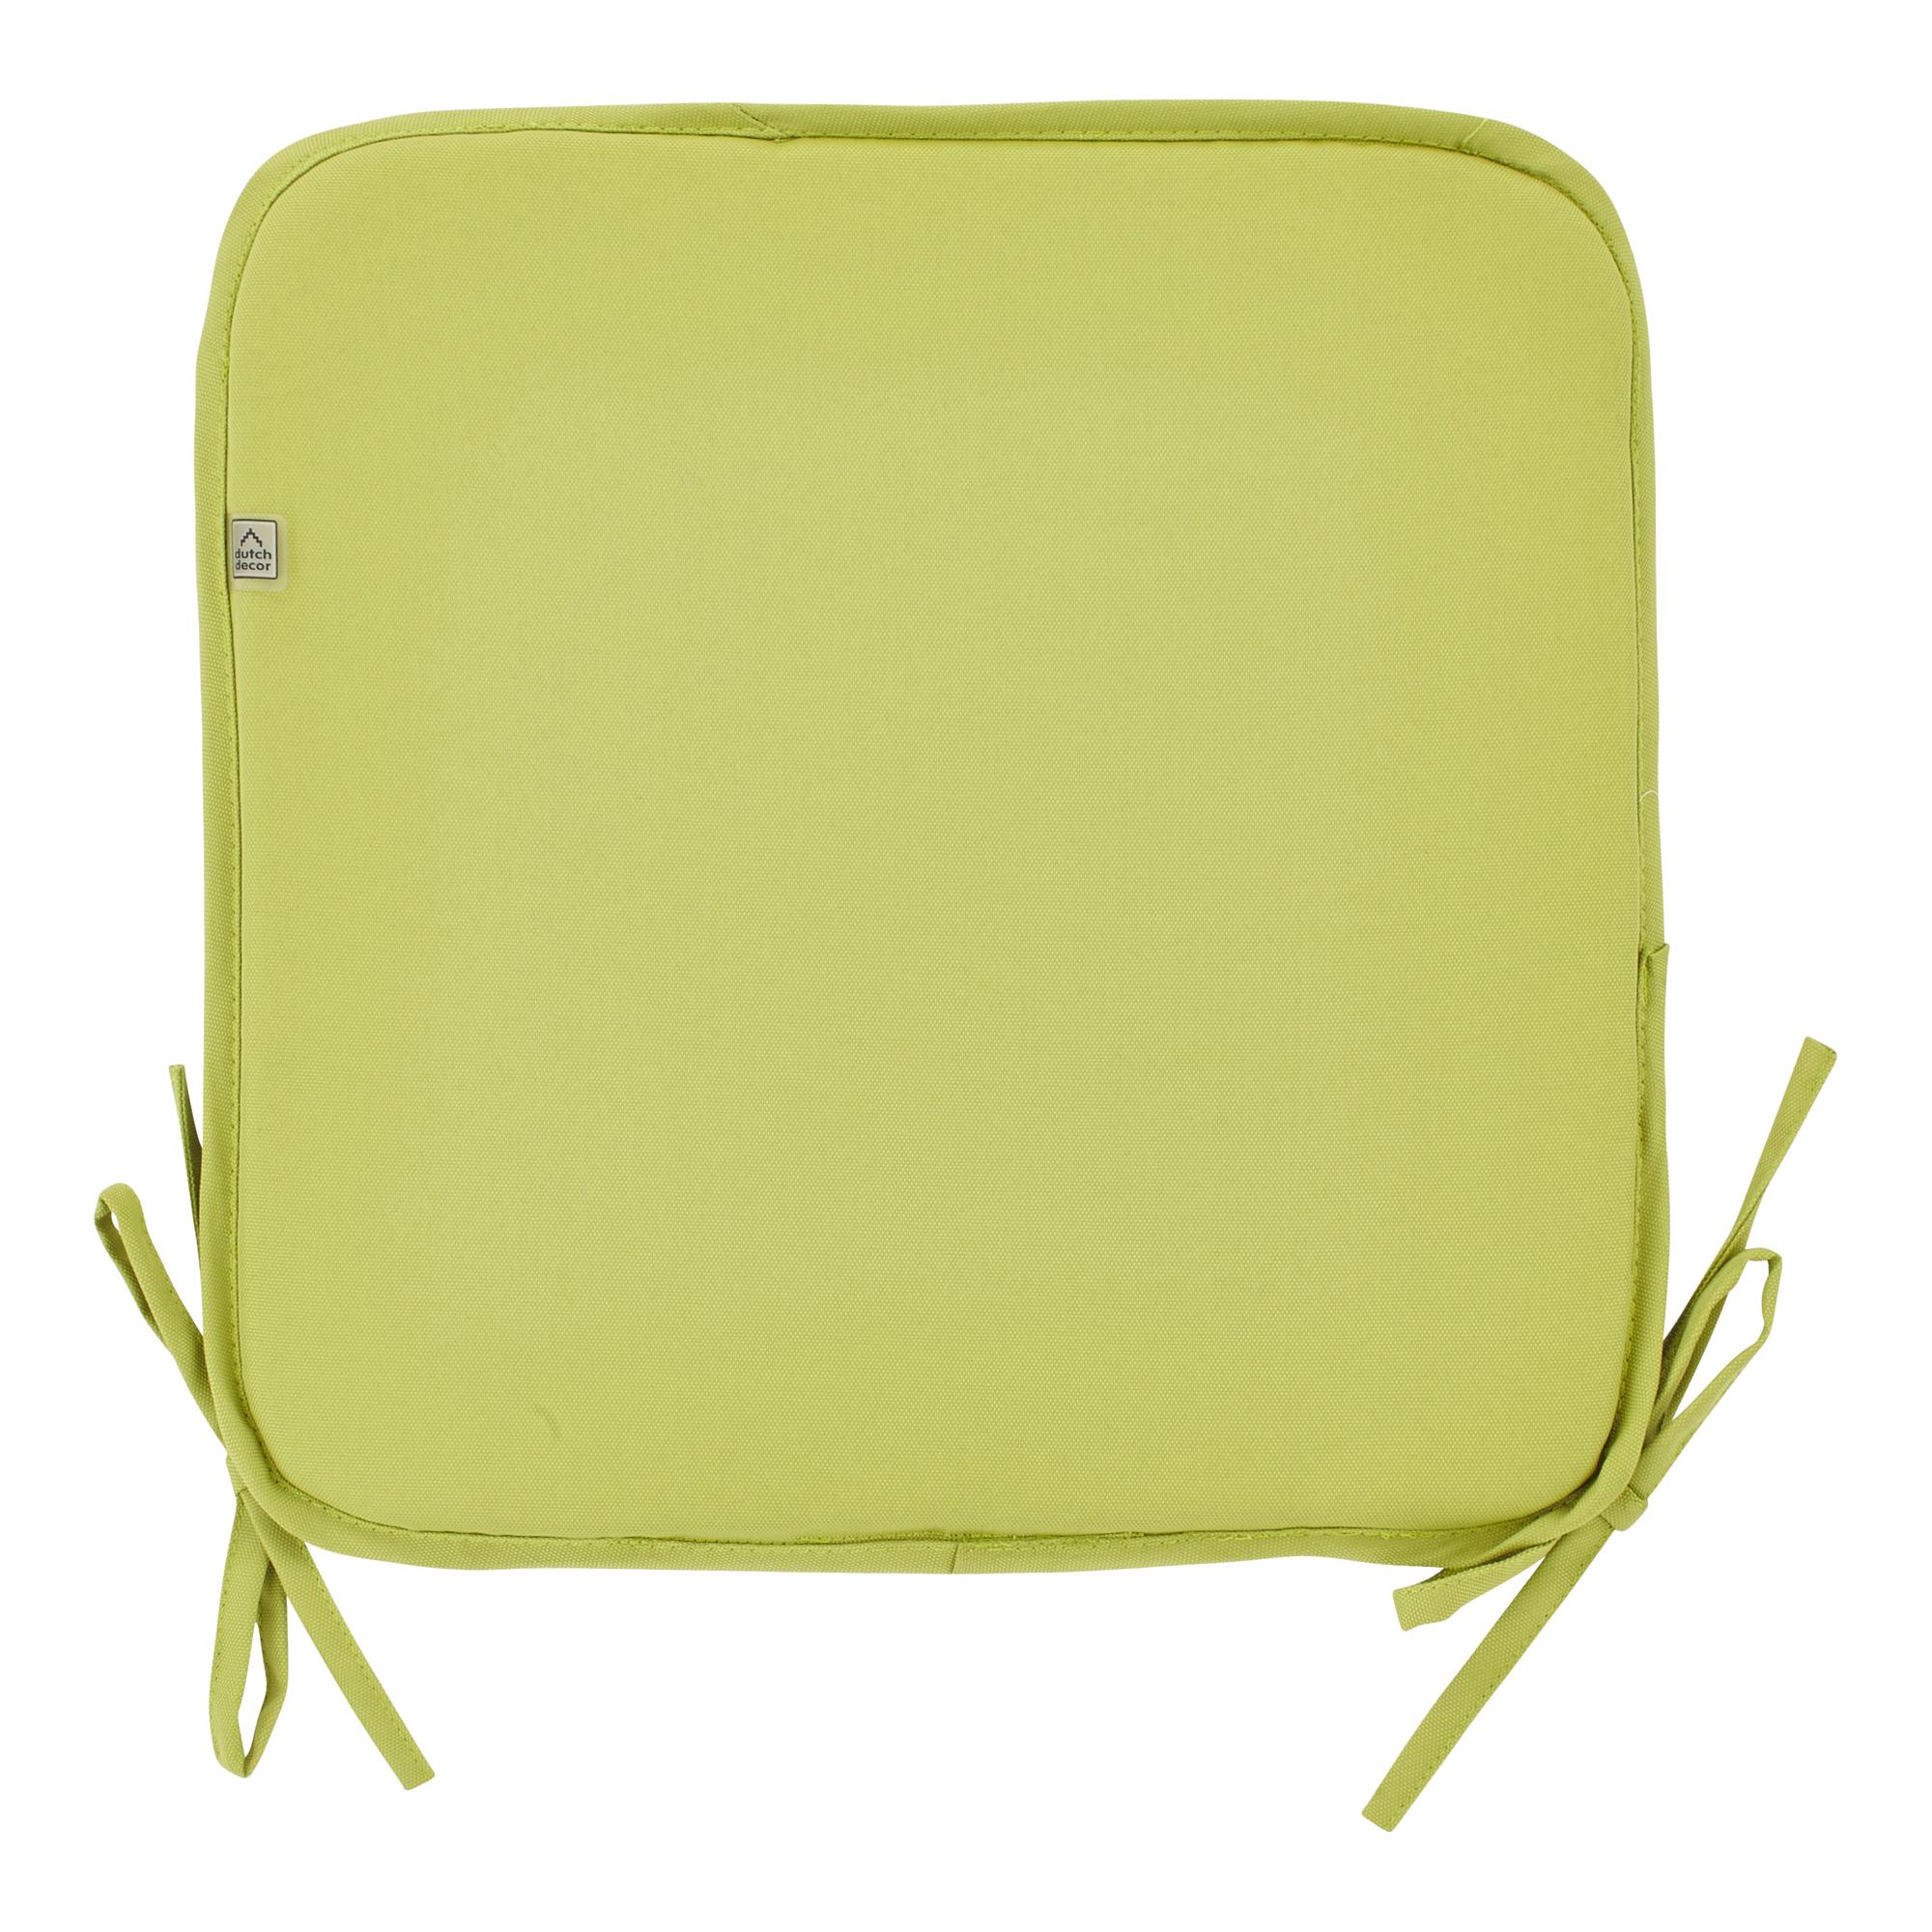 SUNNY - Stoelkussen vierkant met linten Lime 38.5x38.5 cm - model PK2